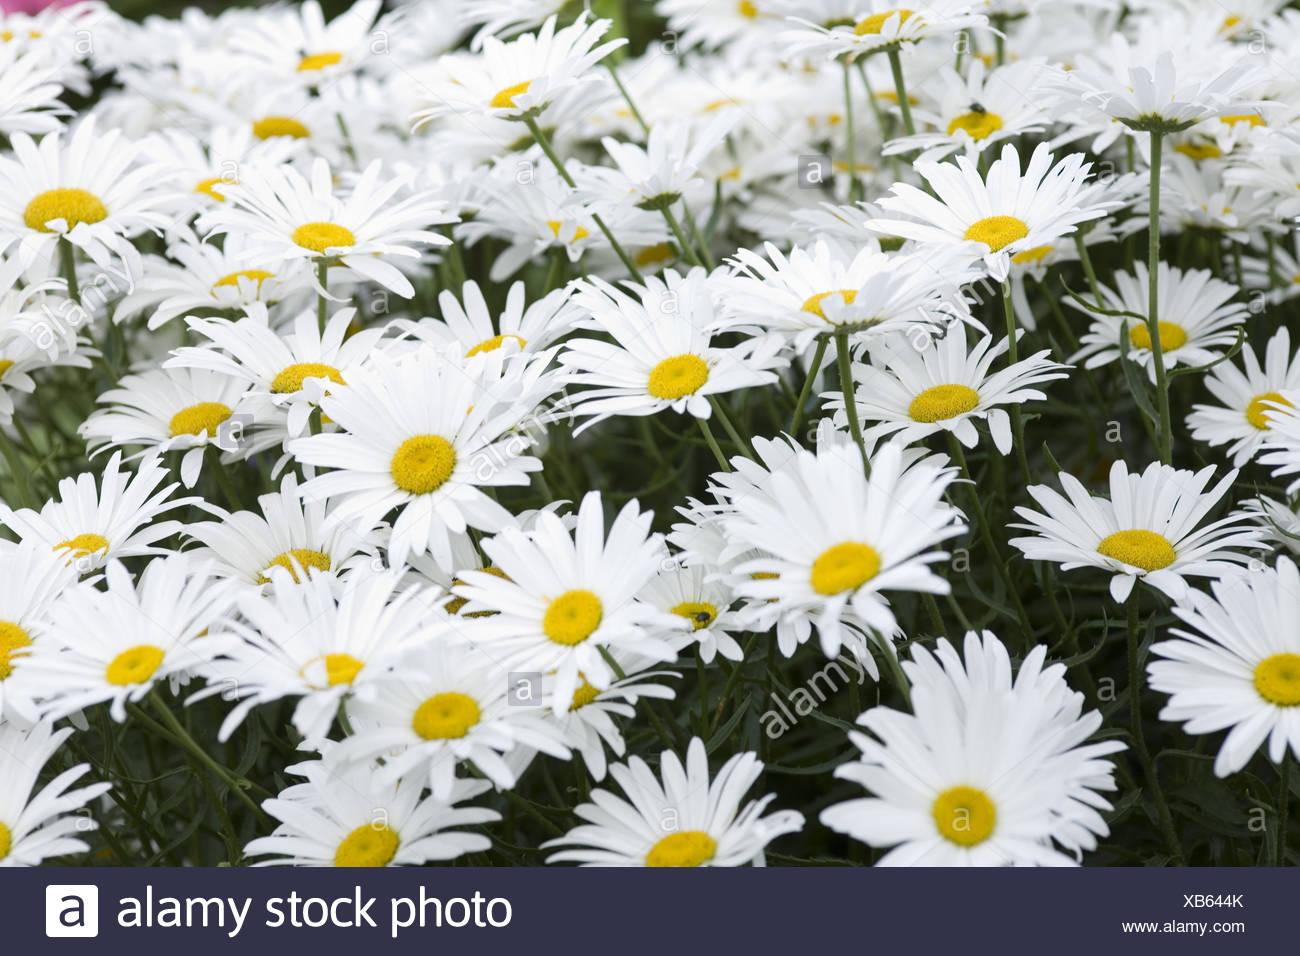 Margin rite meadow, blossoms, medium close-up, - Stock Image